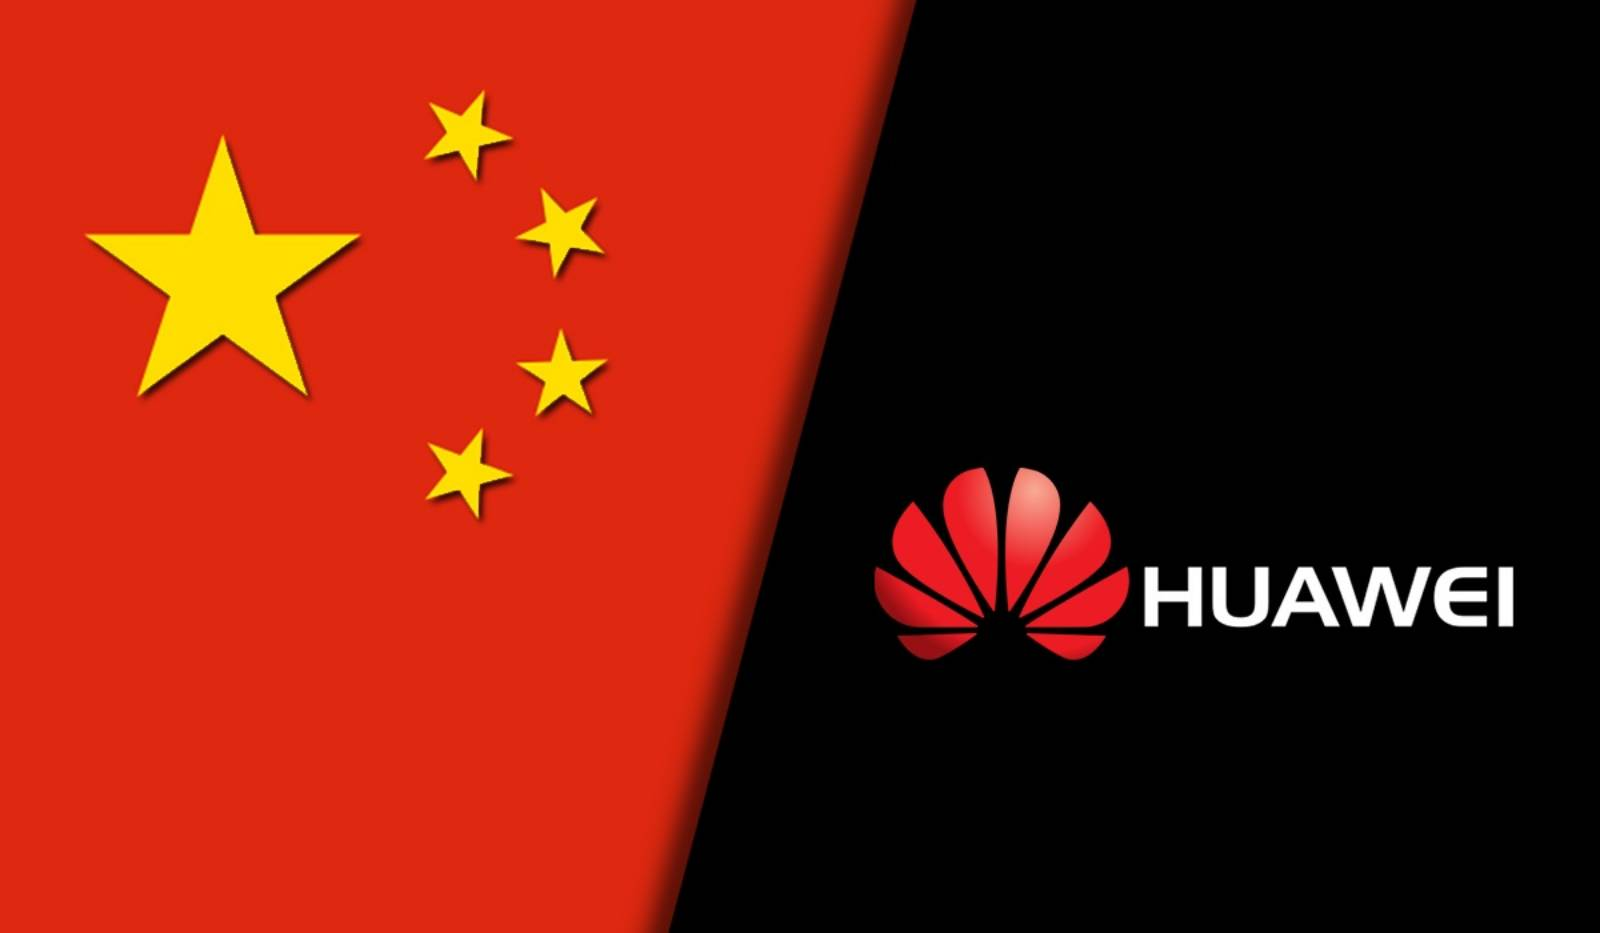 Huawei fereasca